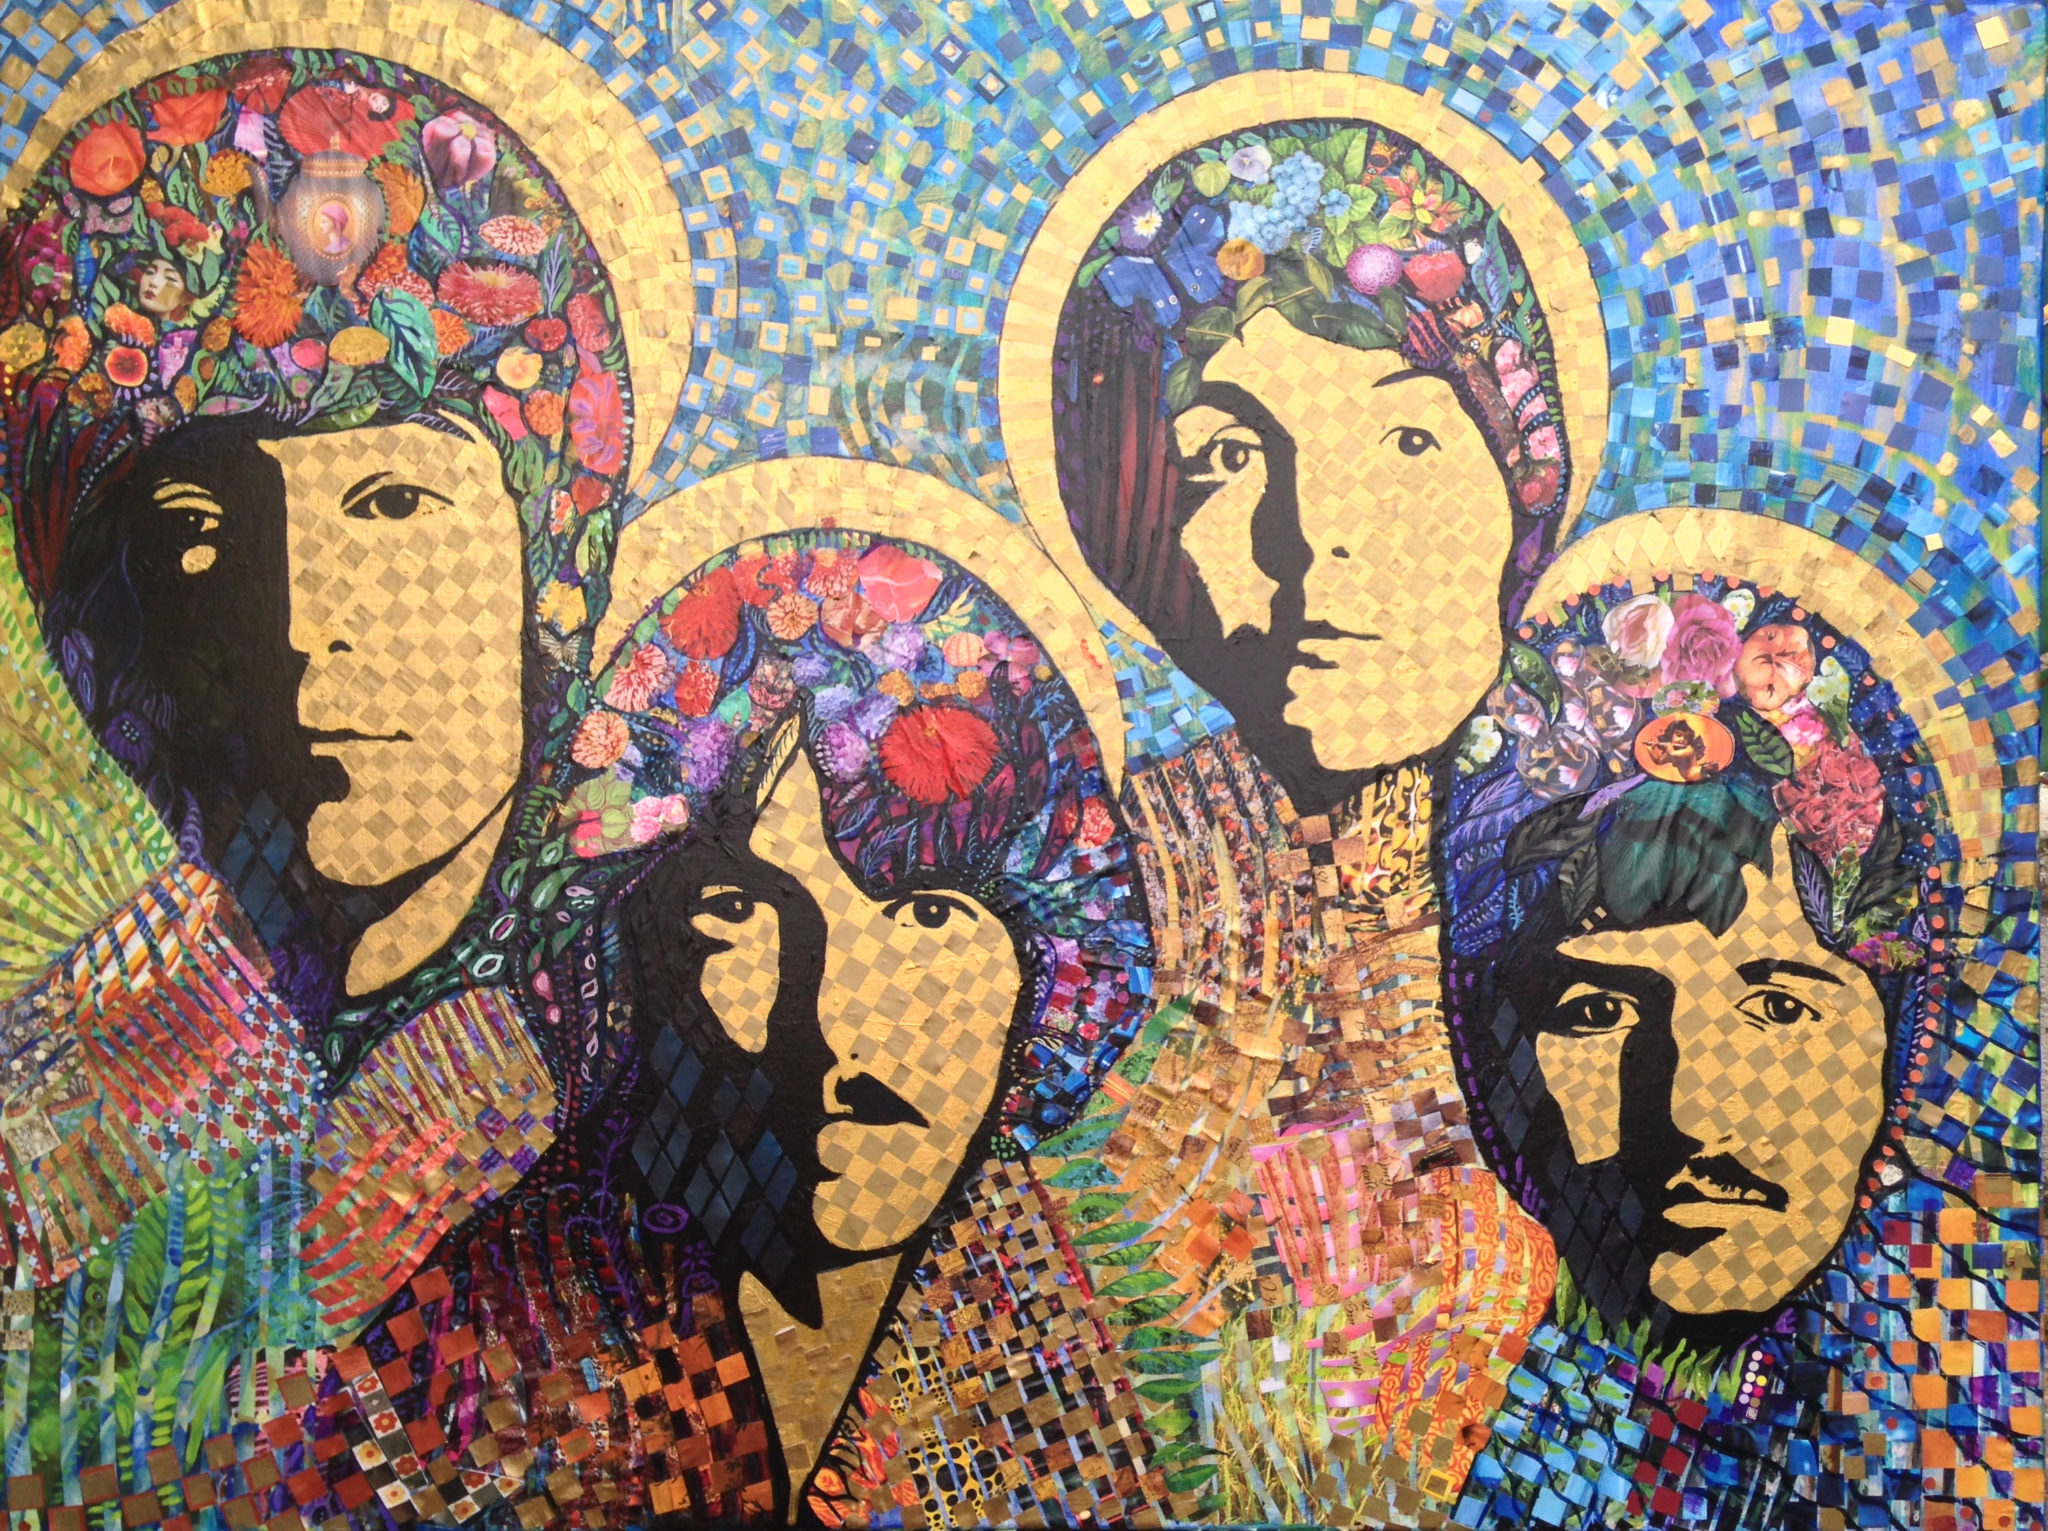 Salvador Dali Collage / Painting | William Wright Art